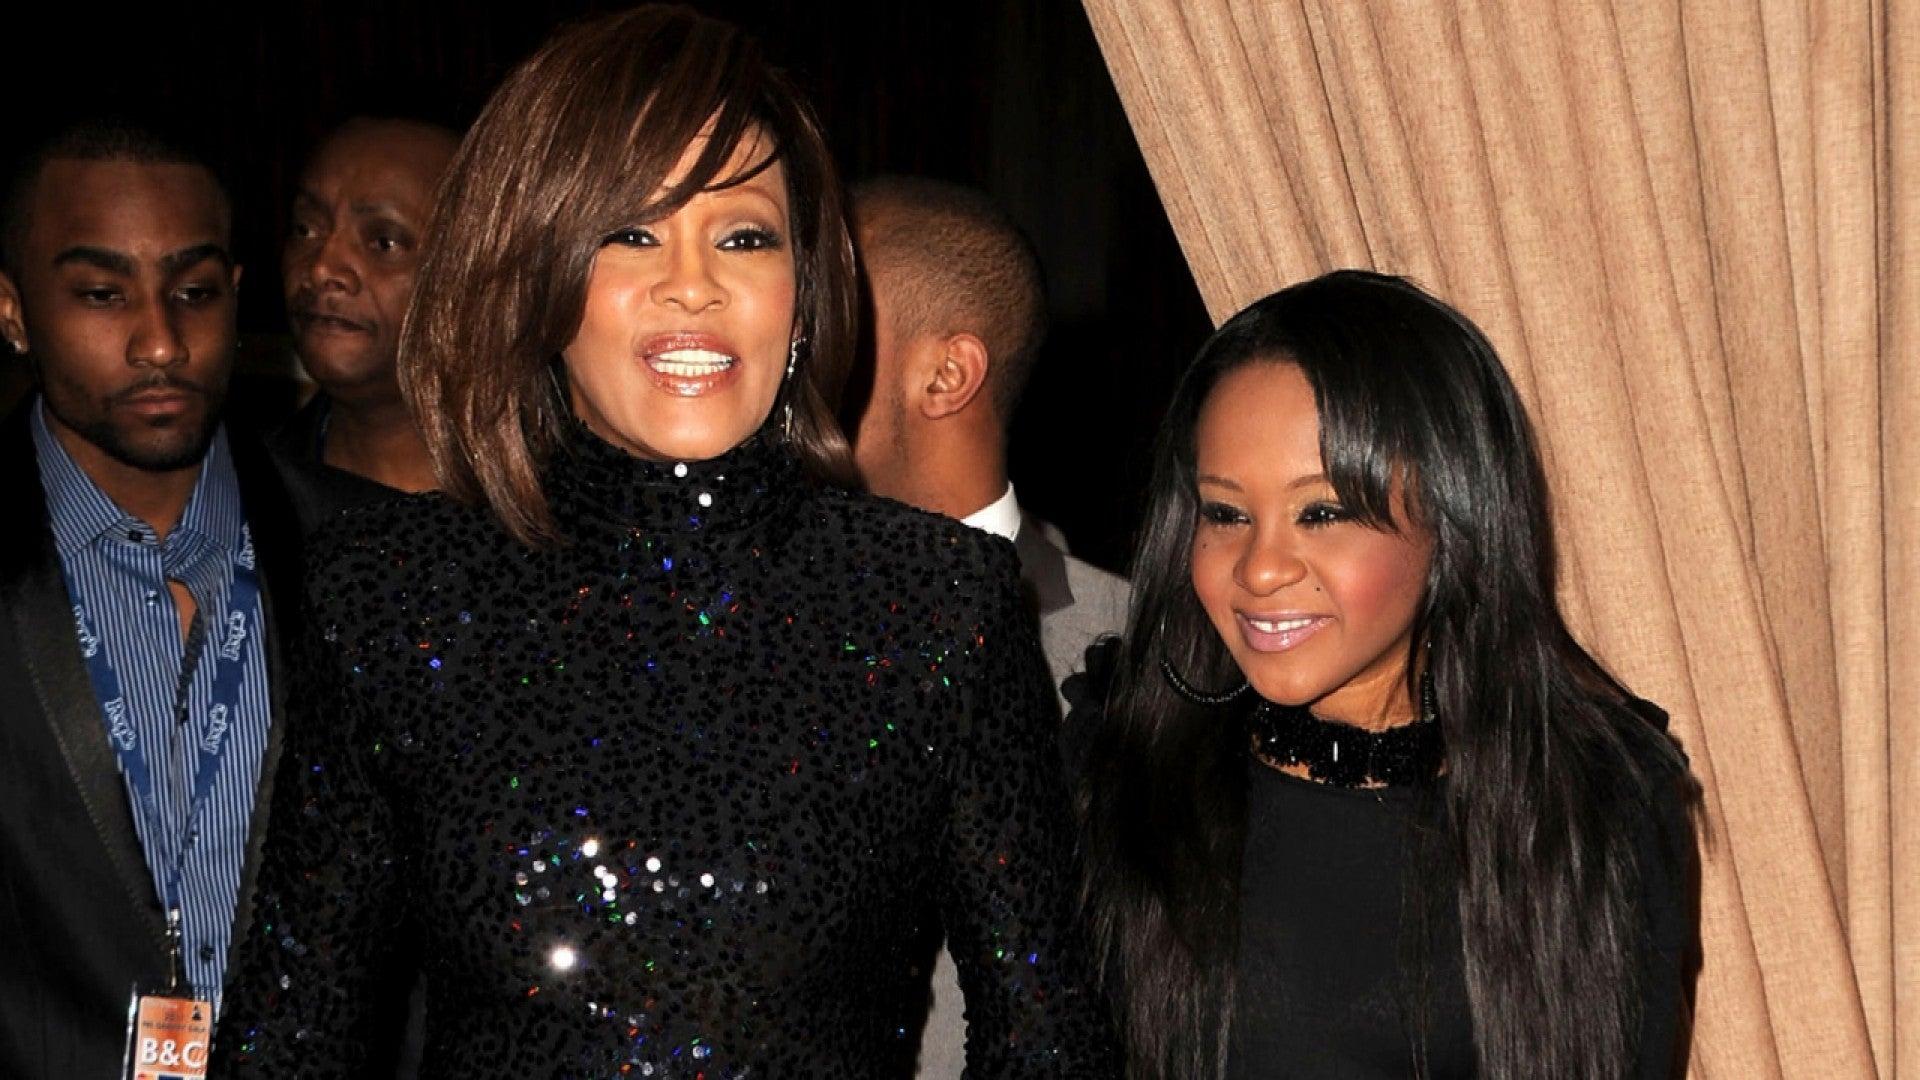 Bobby Brown révèle qui, selon lui, a tué Whitney Houston et sa fille